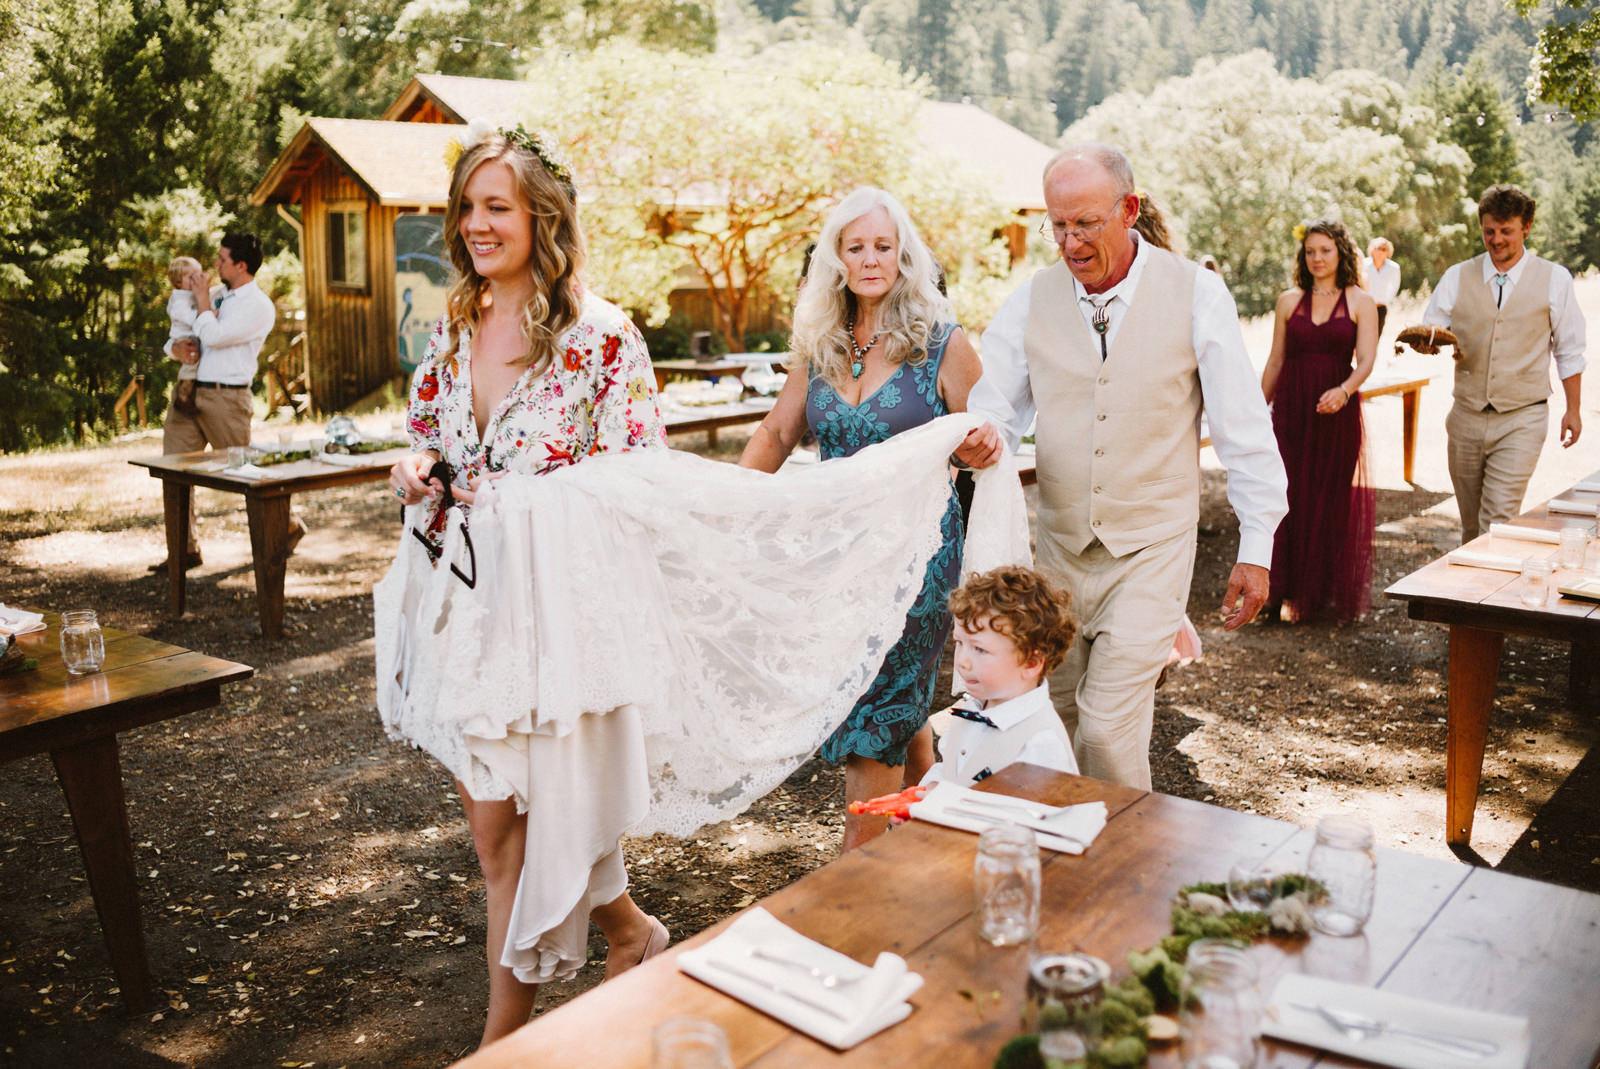 rivers-bend-retreat-wedding-007 RIVER'S BEND RETREAT WEDDING